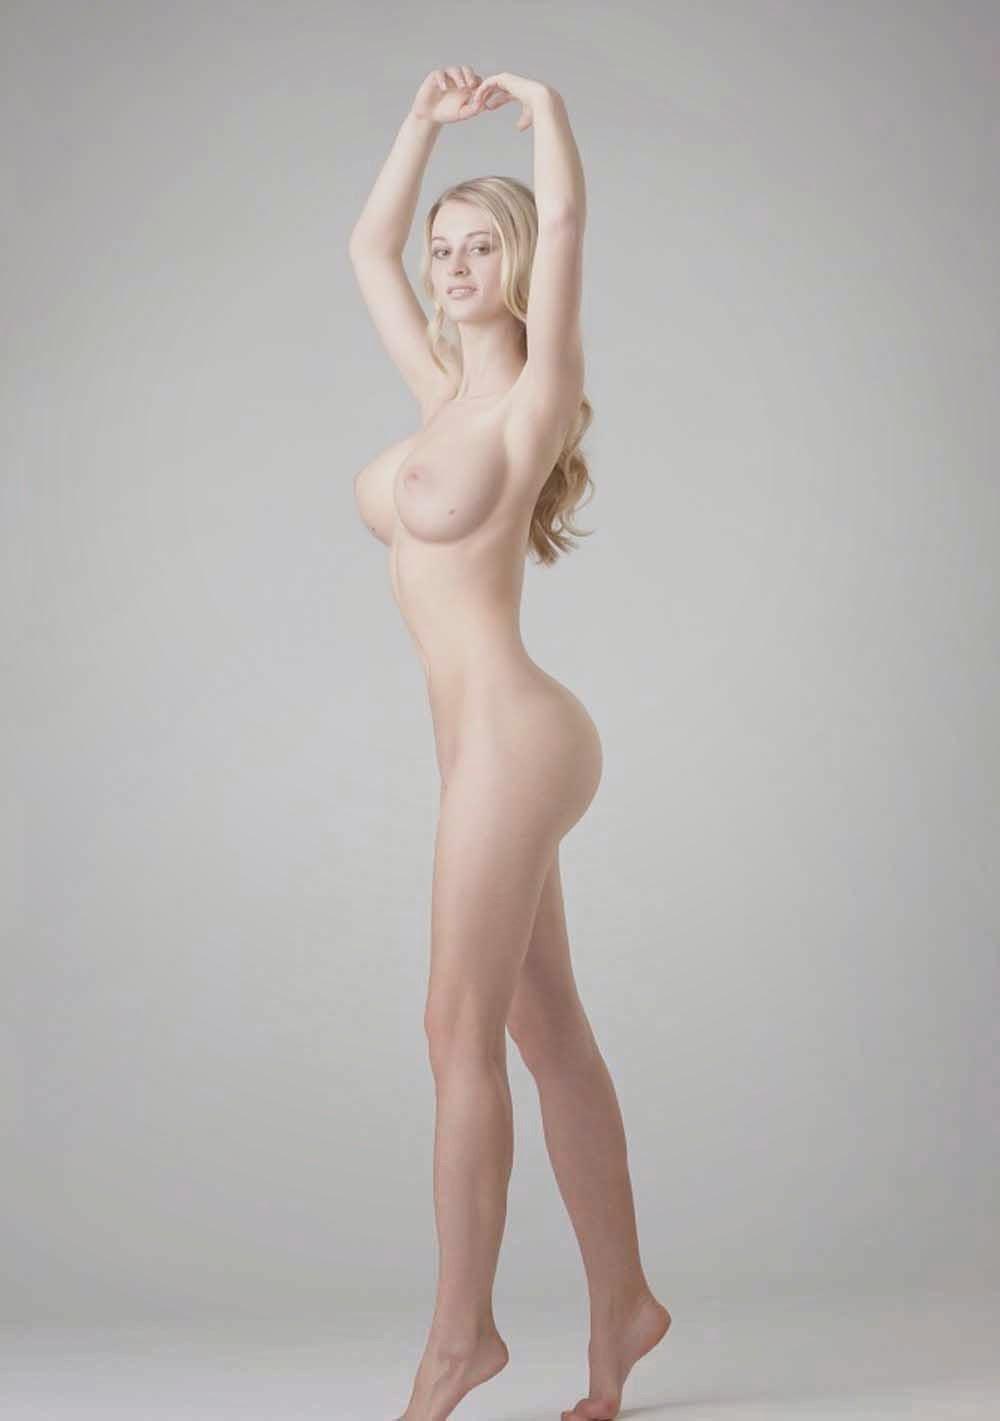 Voluptuous Nude Girls Non-Asian  Gravuregirlz-8553